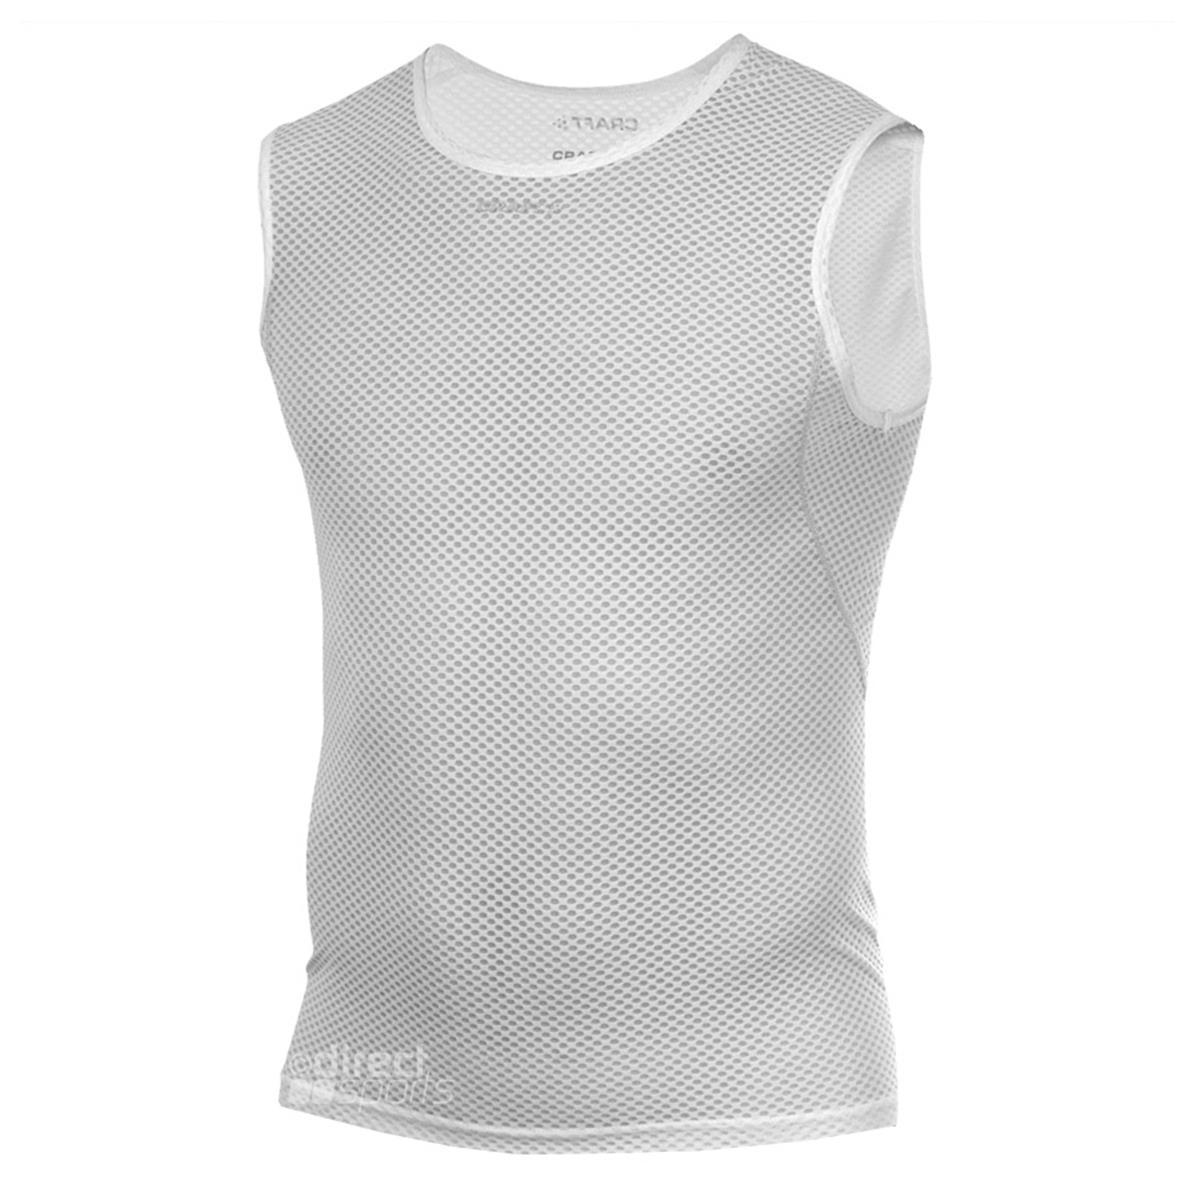 eb97b64672988 Craft Cool Mesh Superlight Sleeveless Top Mens (White)